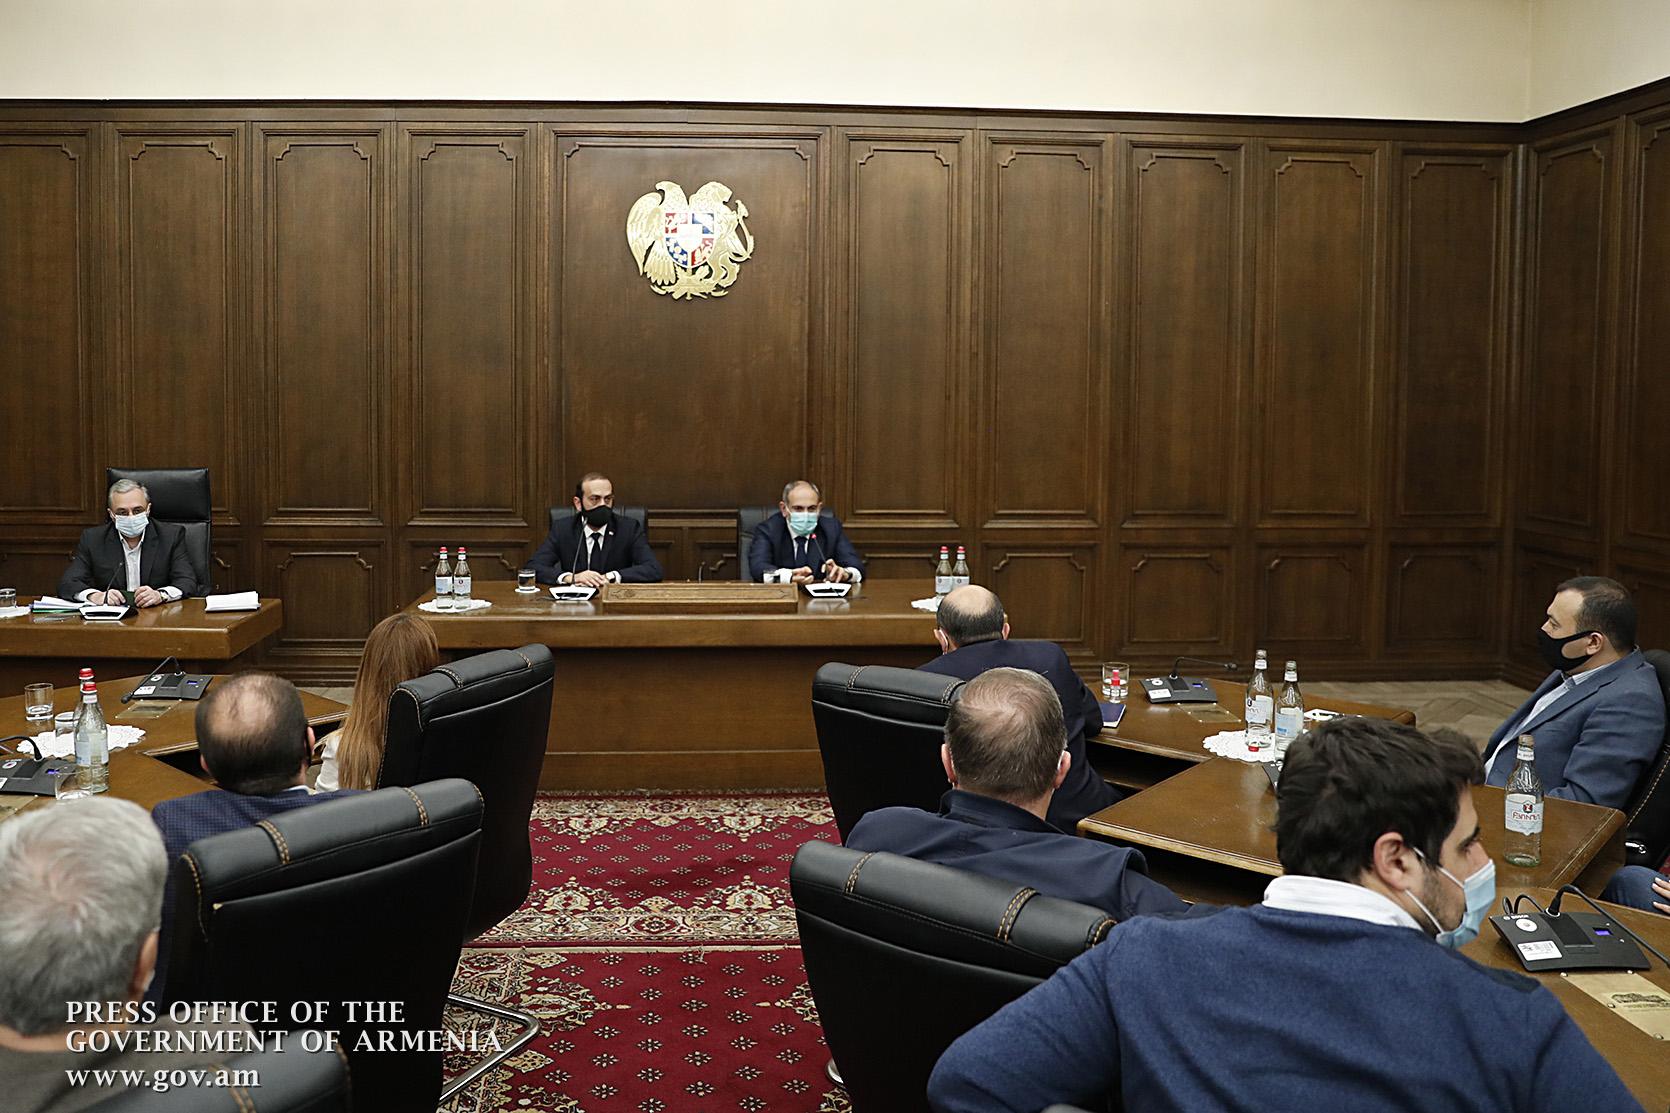 Photo of Վարչապետը հանդիպում է ունեցել ԱԺ խորհրդի անդամների հետ